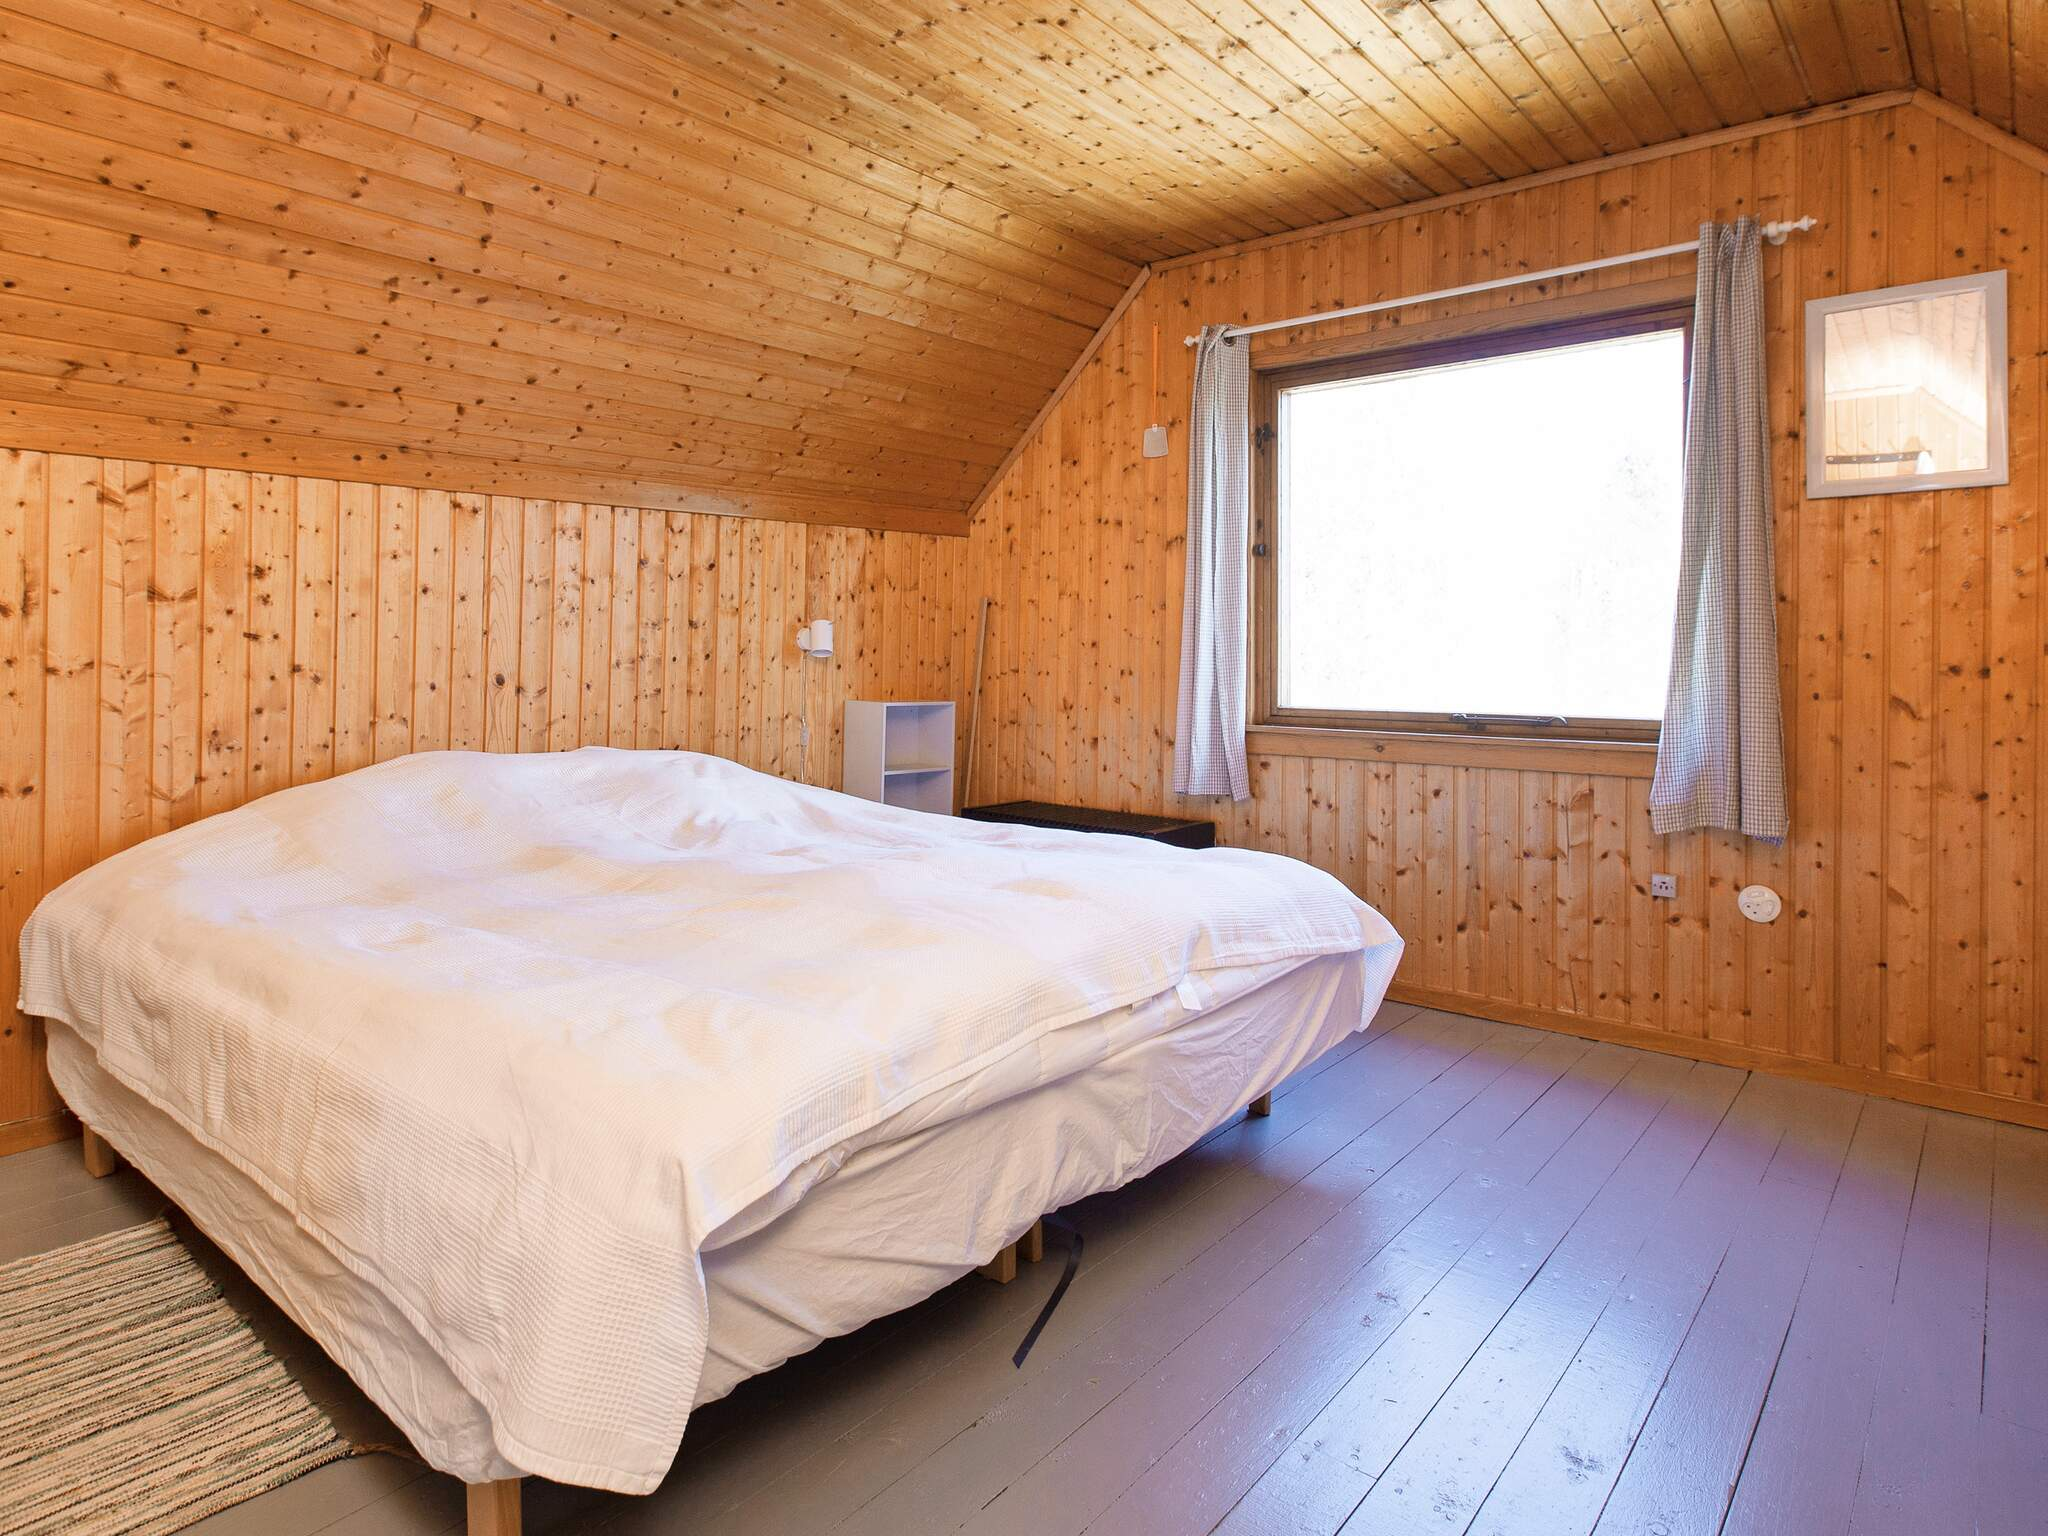 Ferienhaus Ellinge Lyng (2587875), Vig, , Westseeland, Dänemark, Bild 11